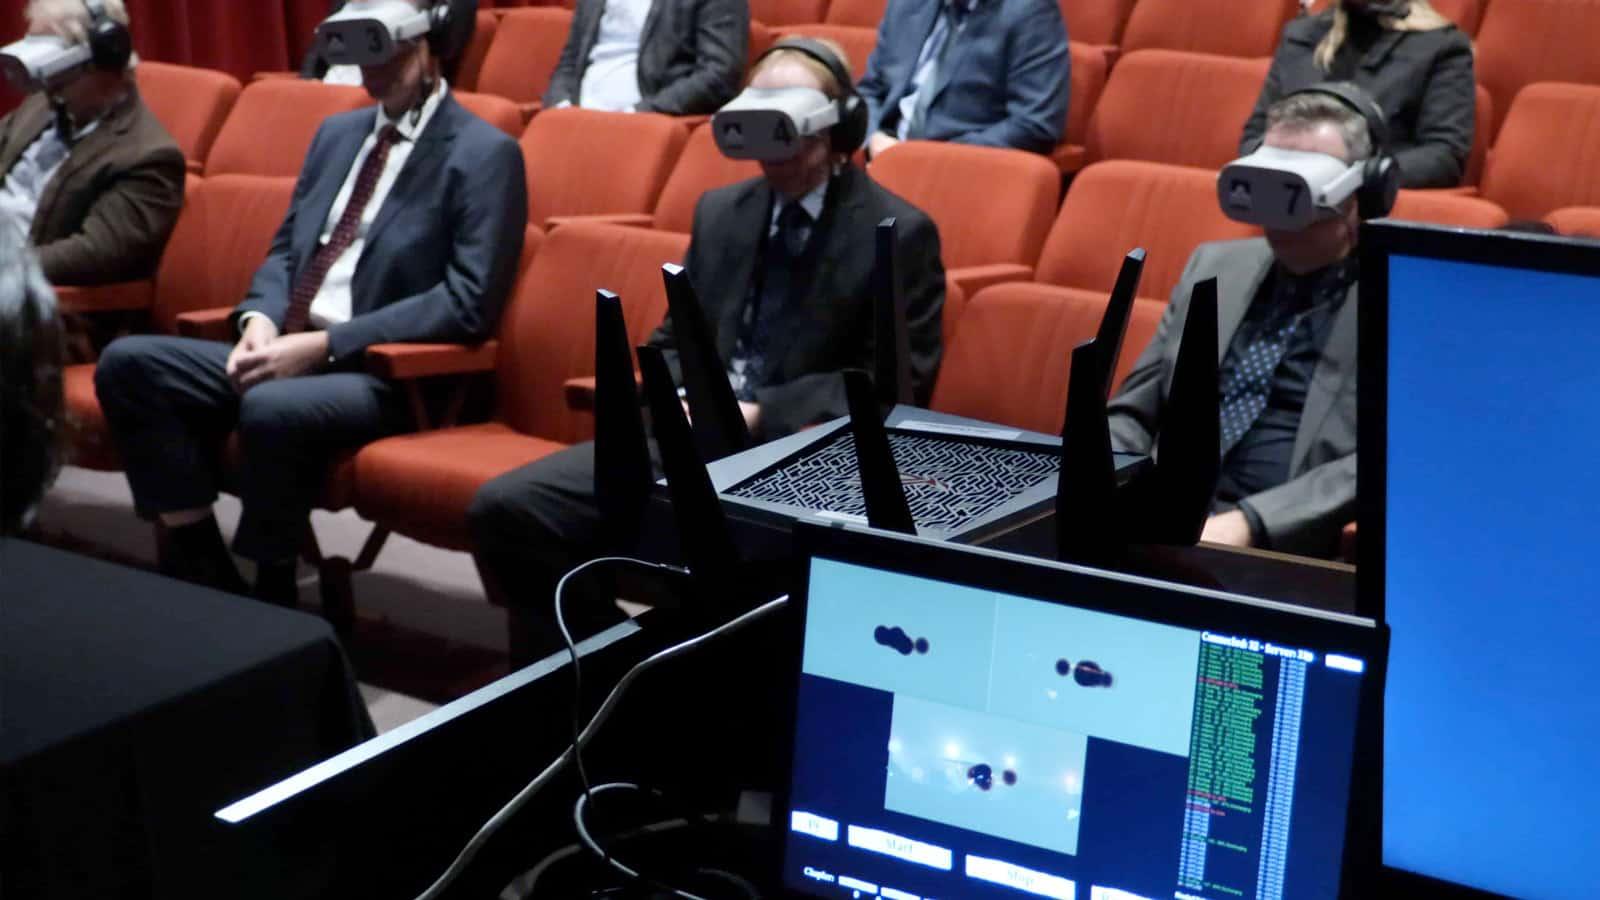 Battle of Hamel VR Experience